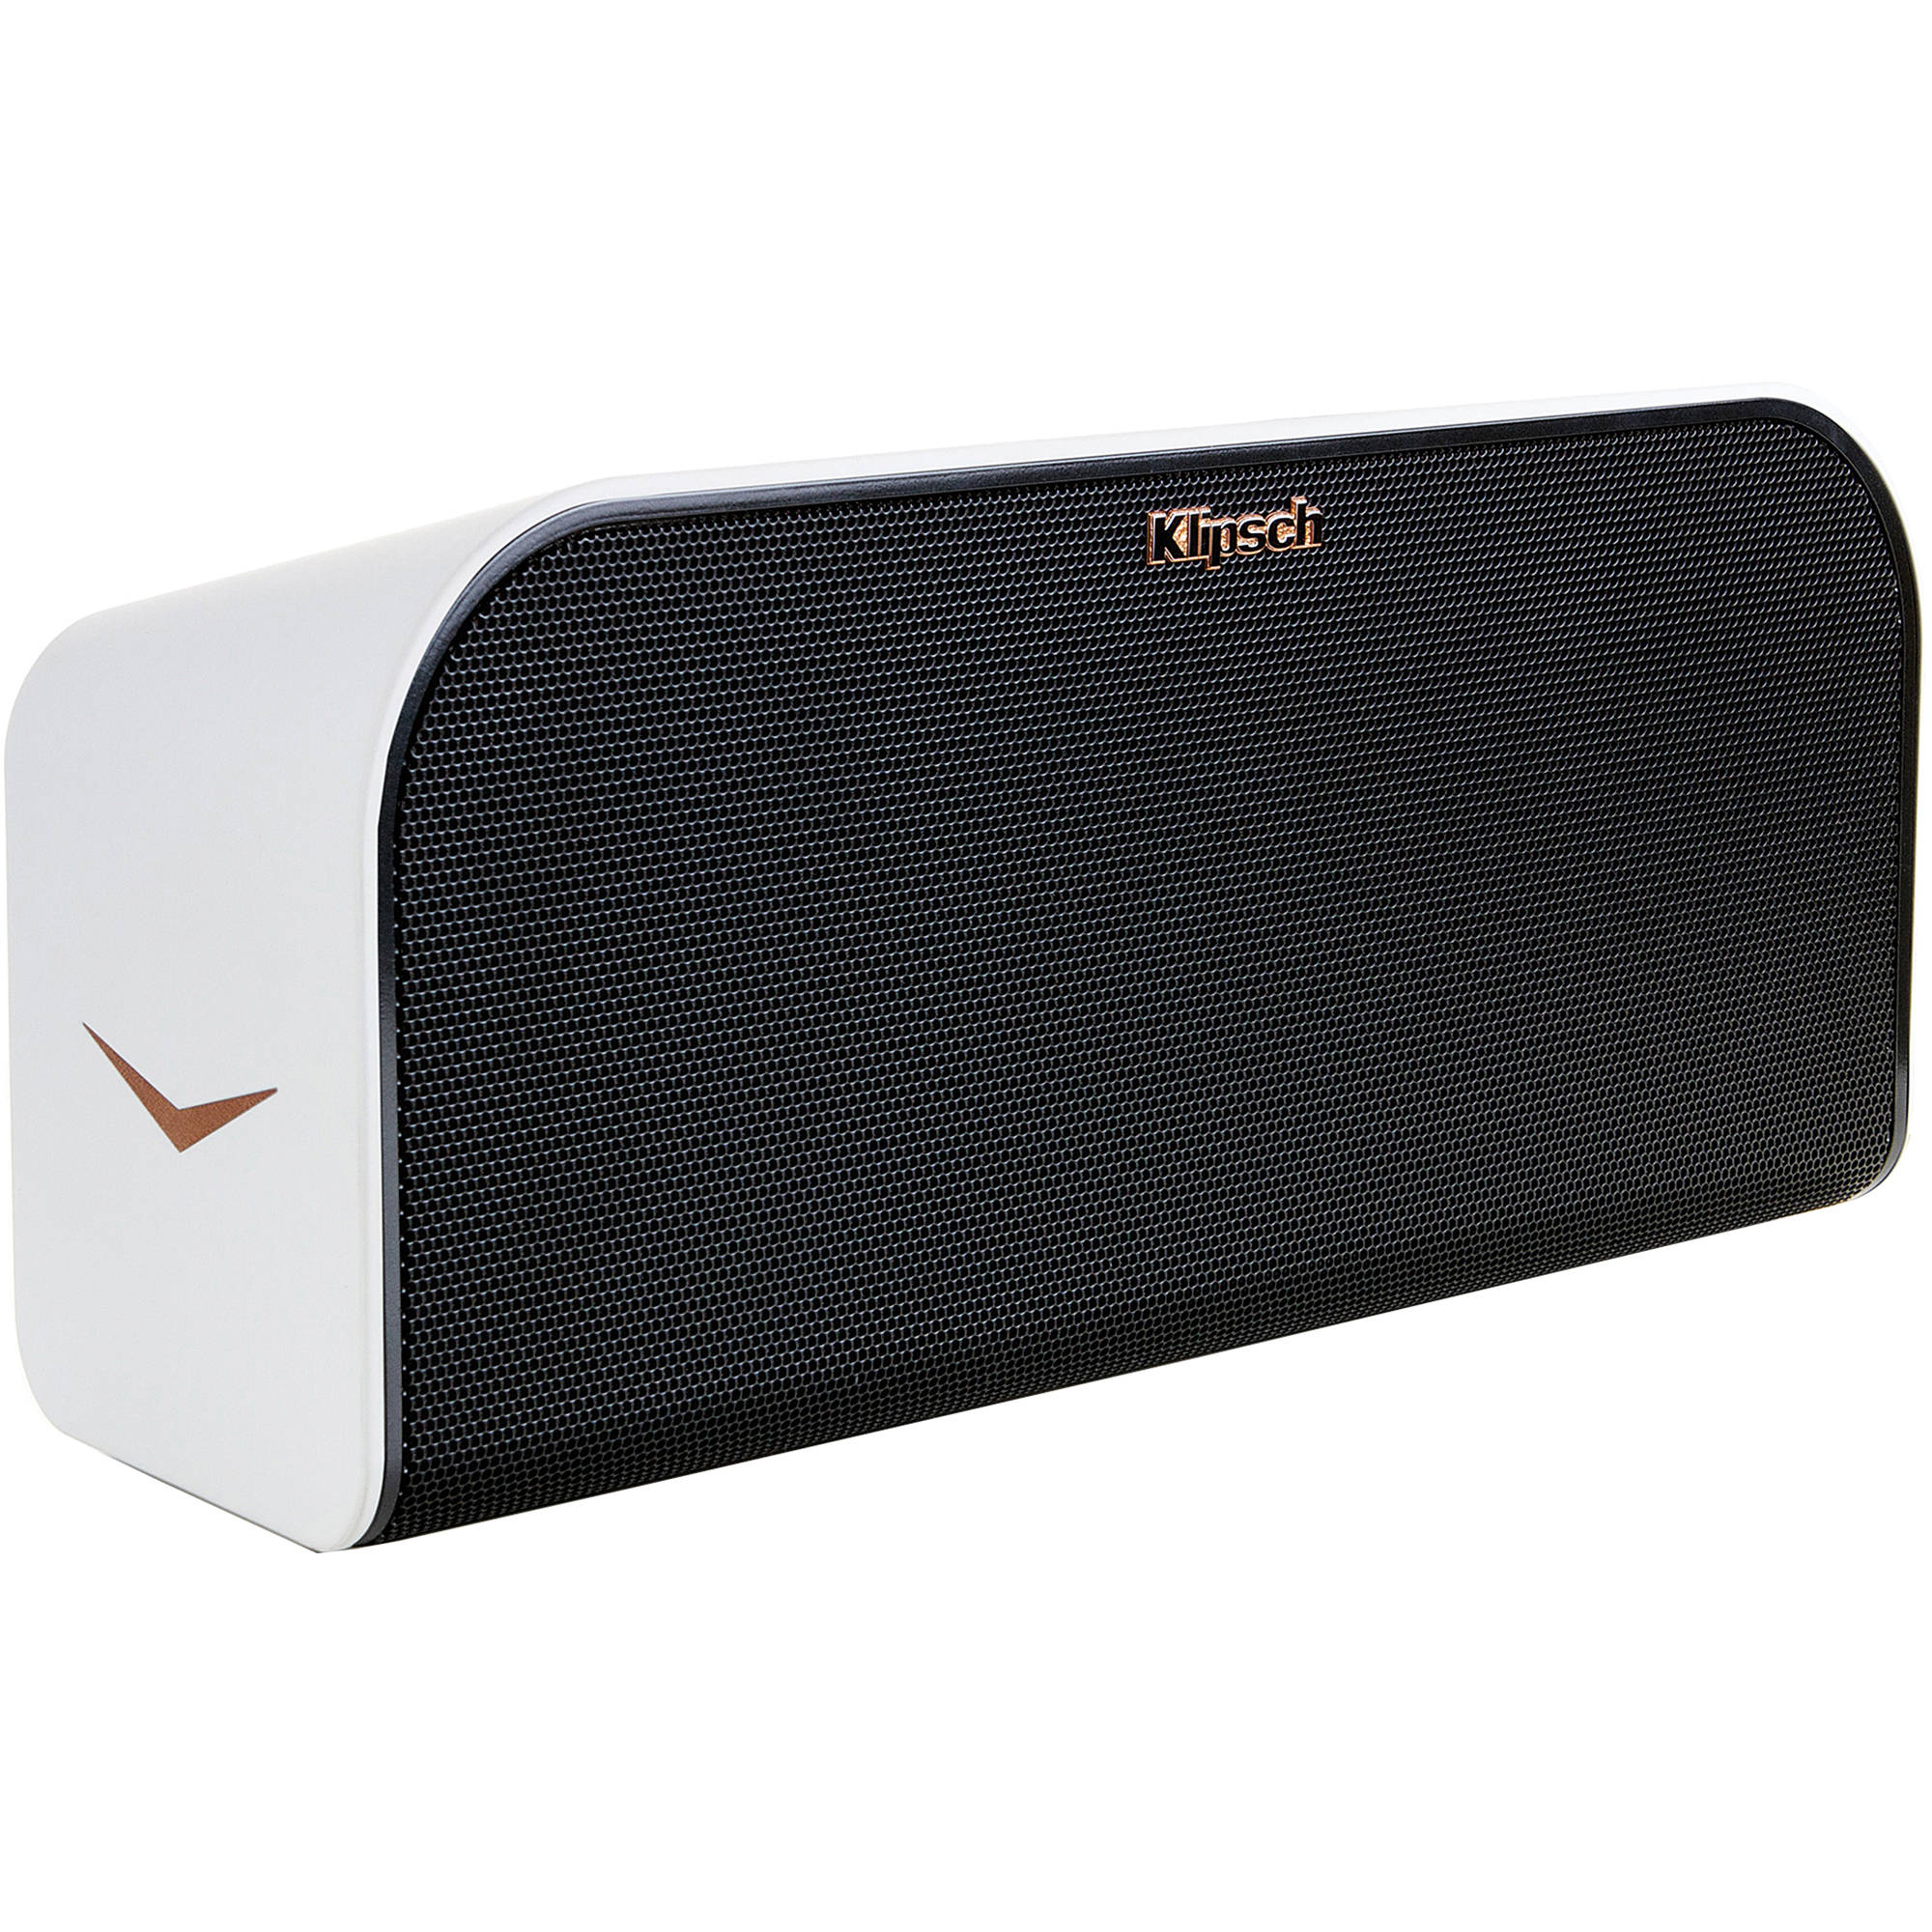 klipsch 1016240 kmc 3 2 1 wireless home music system 1016240 b h. Black Bedroom Furniture Sets. Home Design Ideas